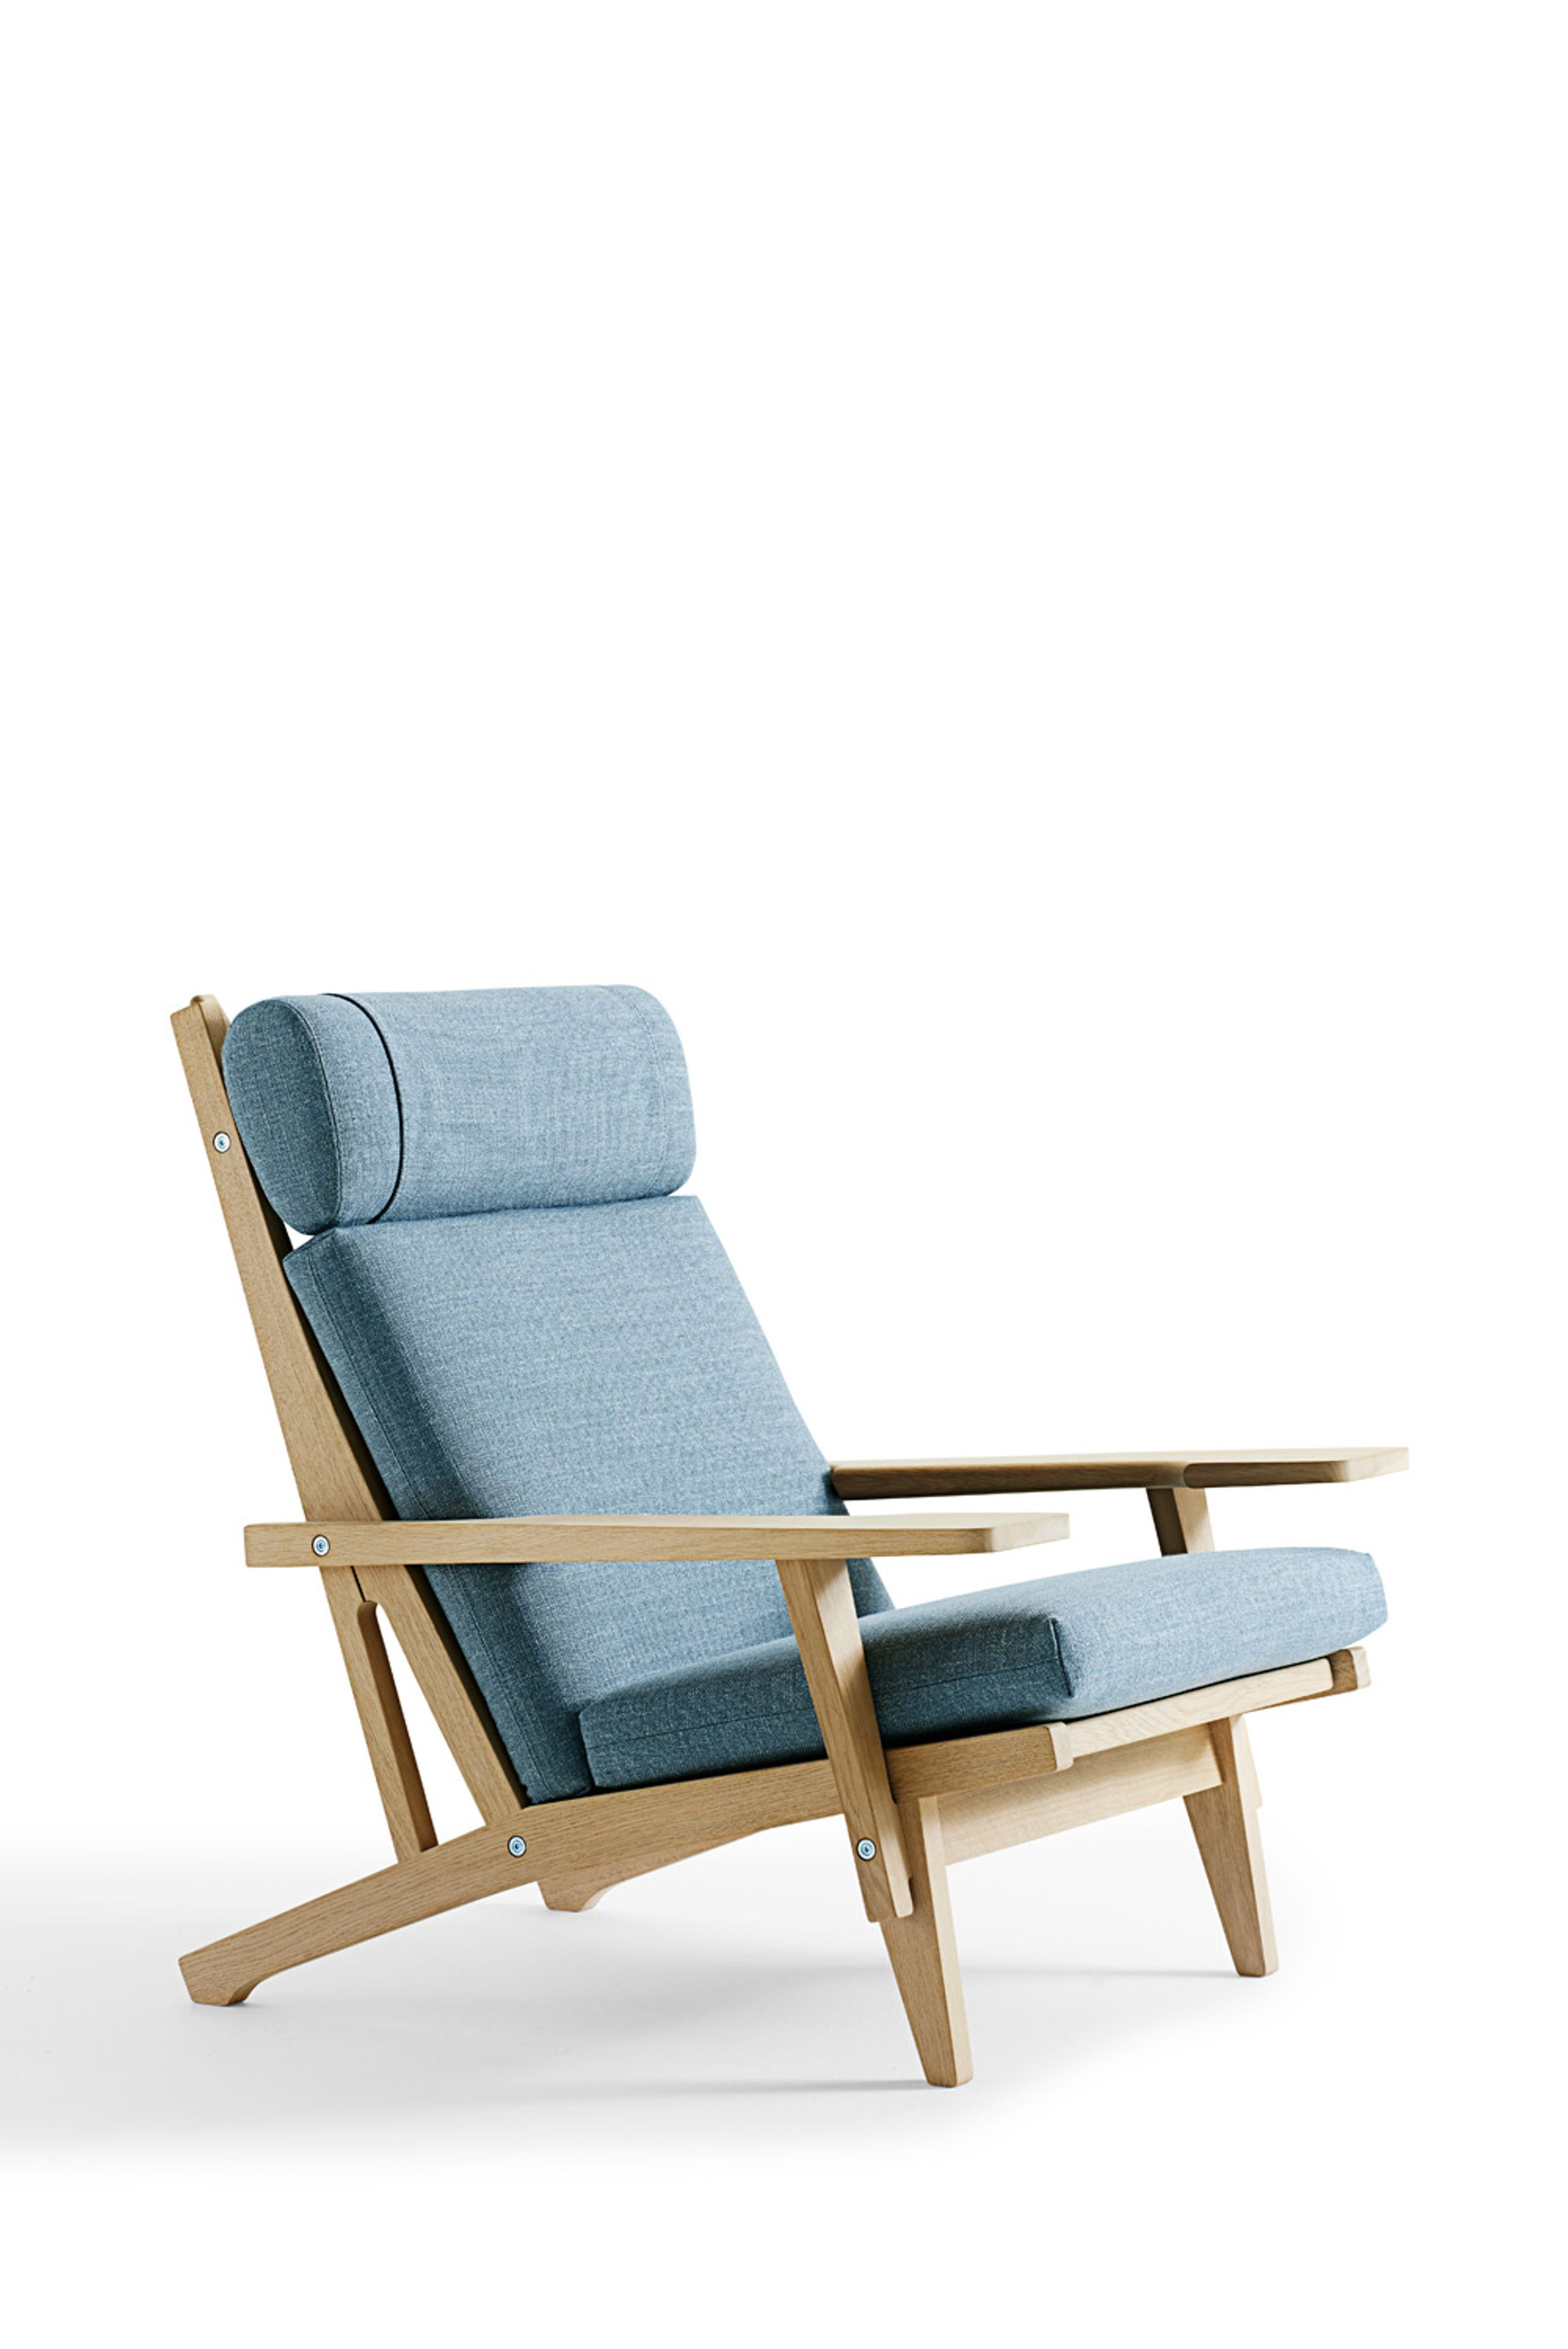 Ge370 Easy Chair High Back By Hans J Wegner Chair Getama